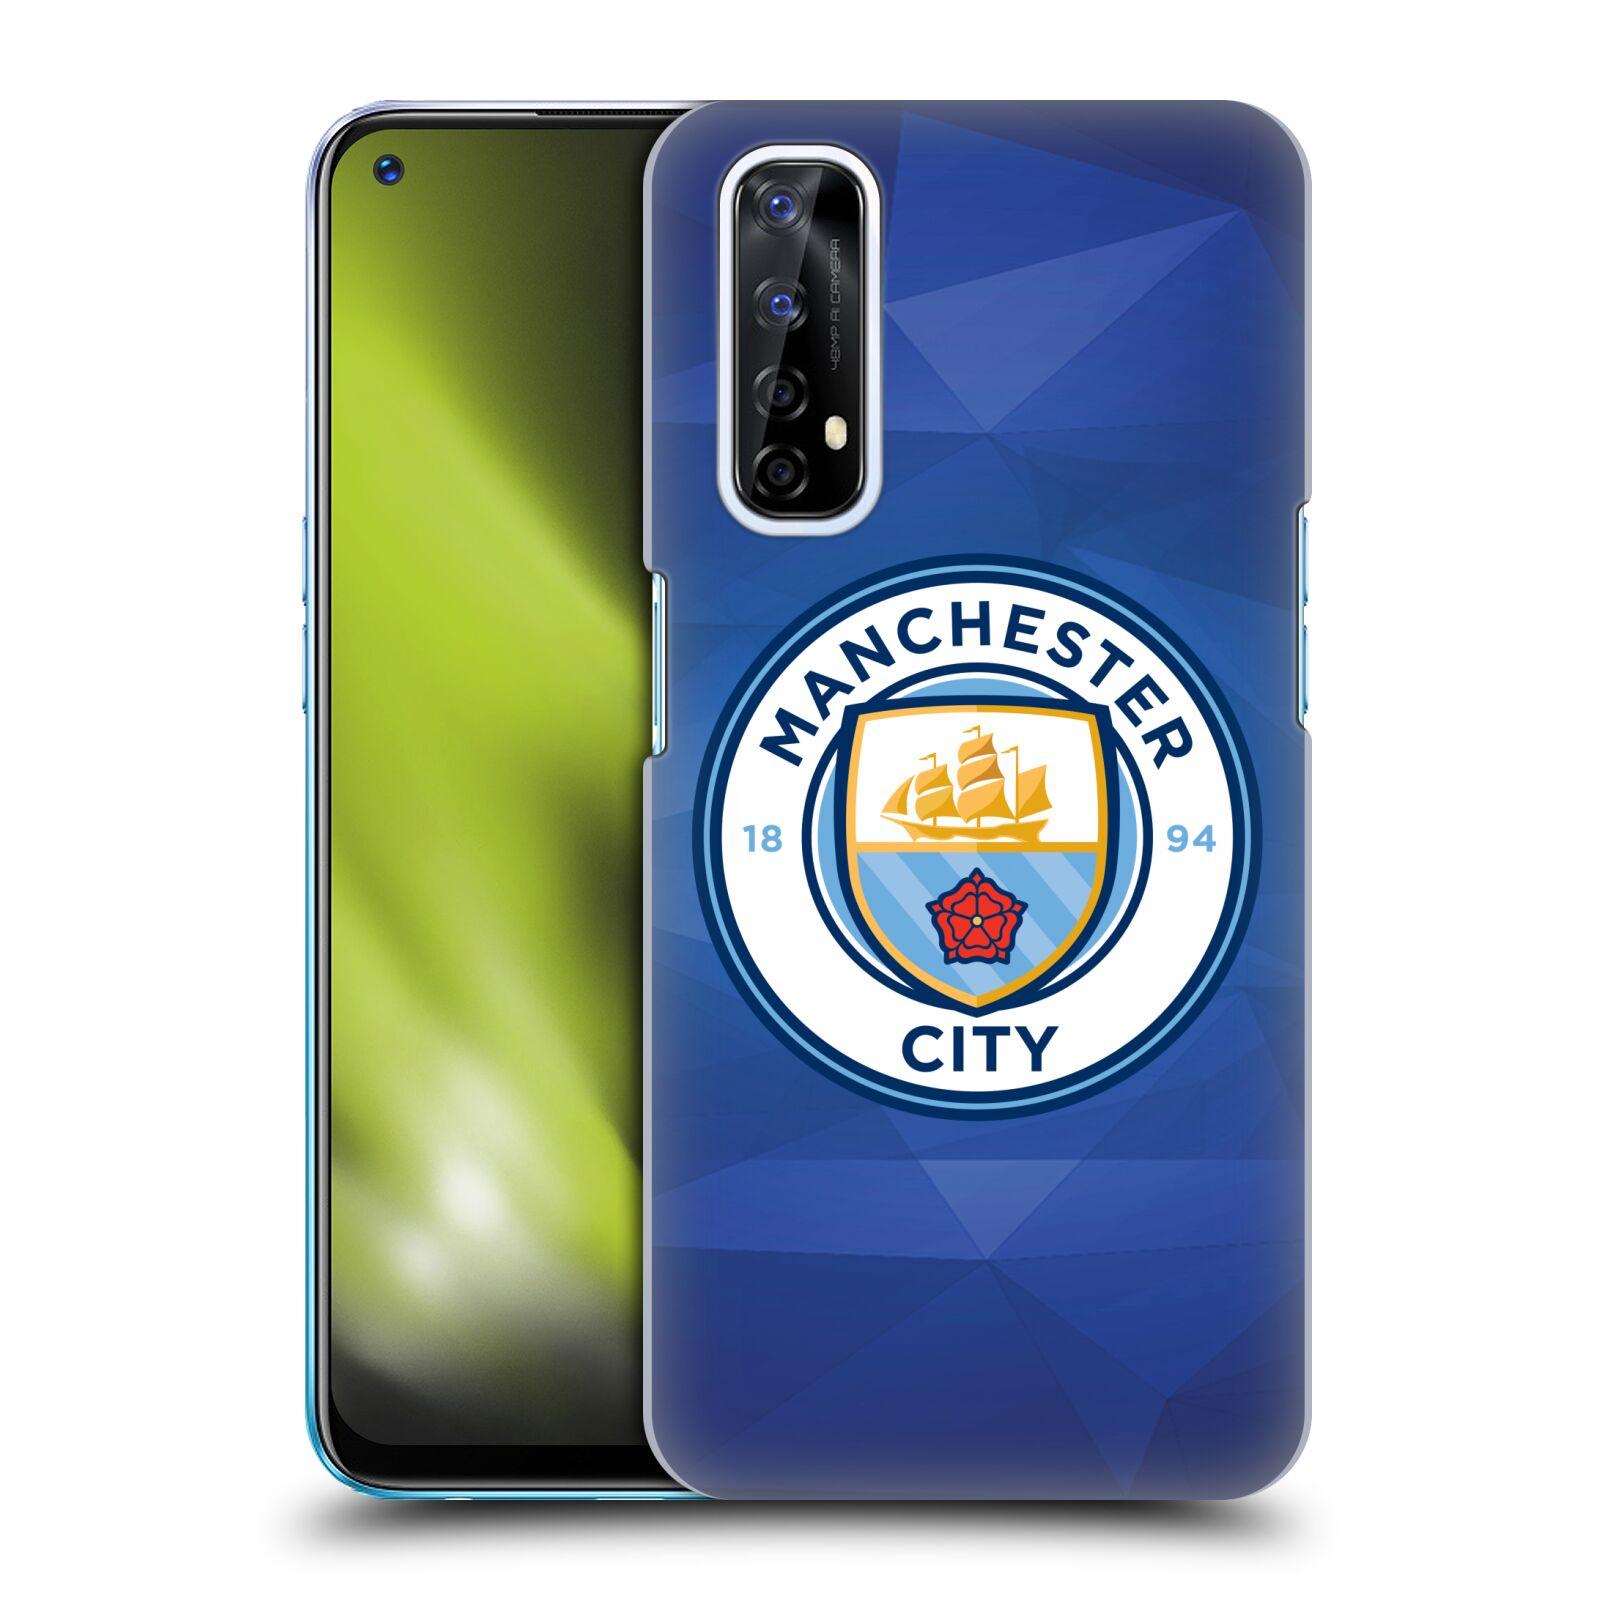 Plastové pouzdro na mobil Realme 7 - Head Case - Manchester City FC - Modré nové logo